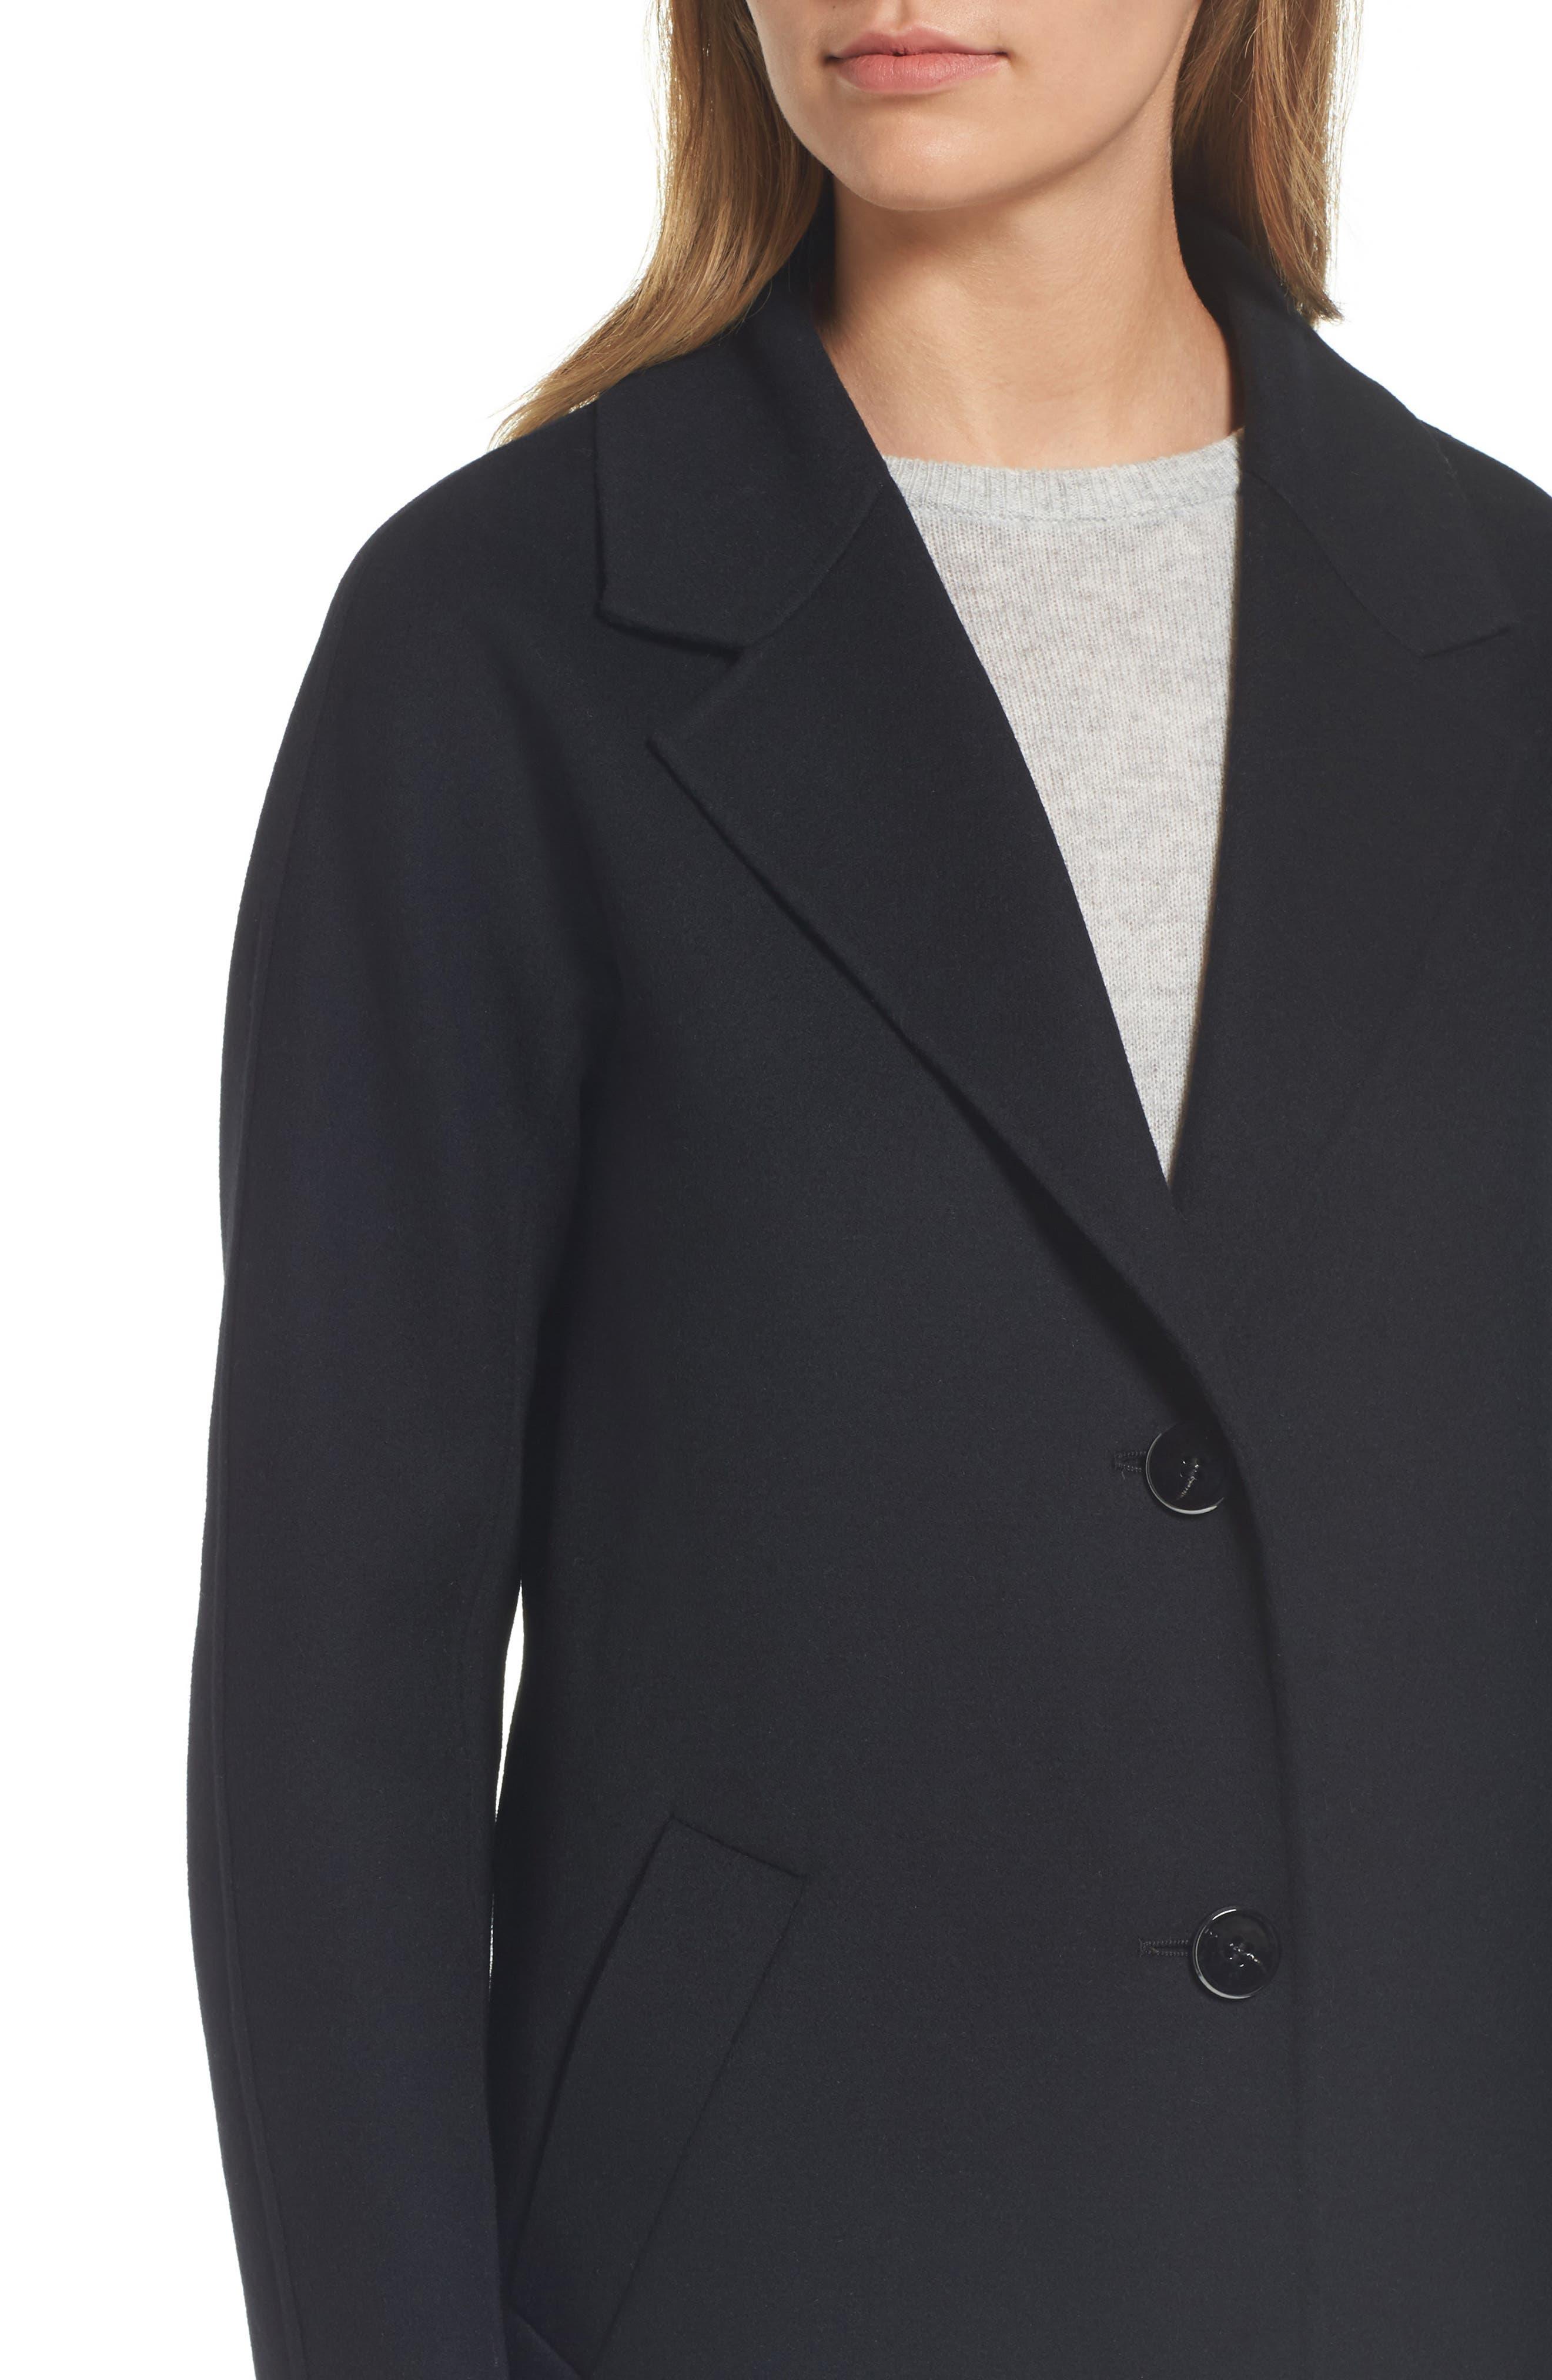 Adriana Wool Reefer Coat,                             Alternate thumbnail 4, color,                             001